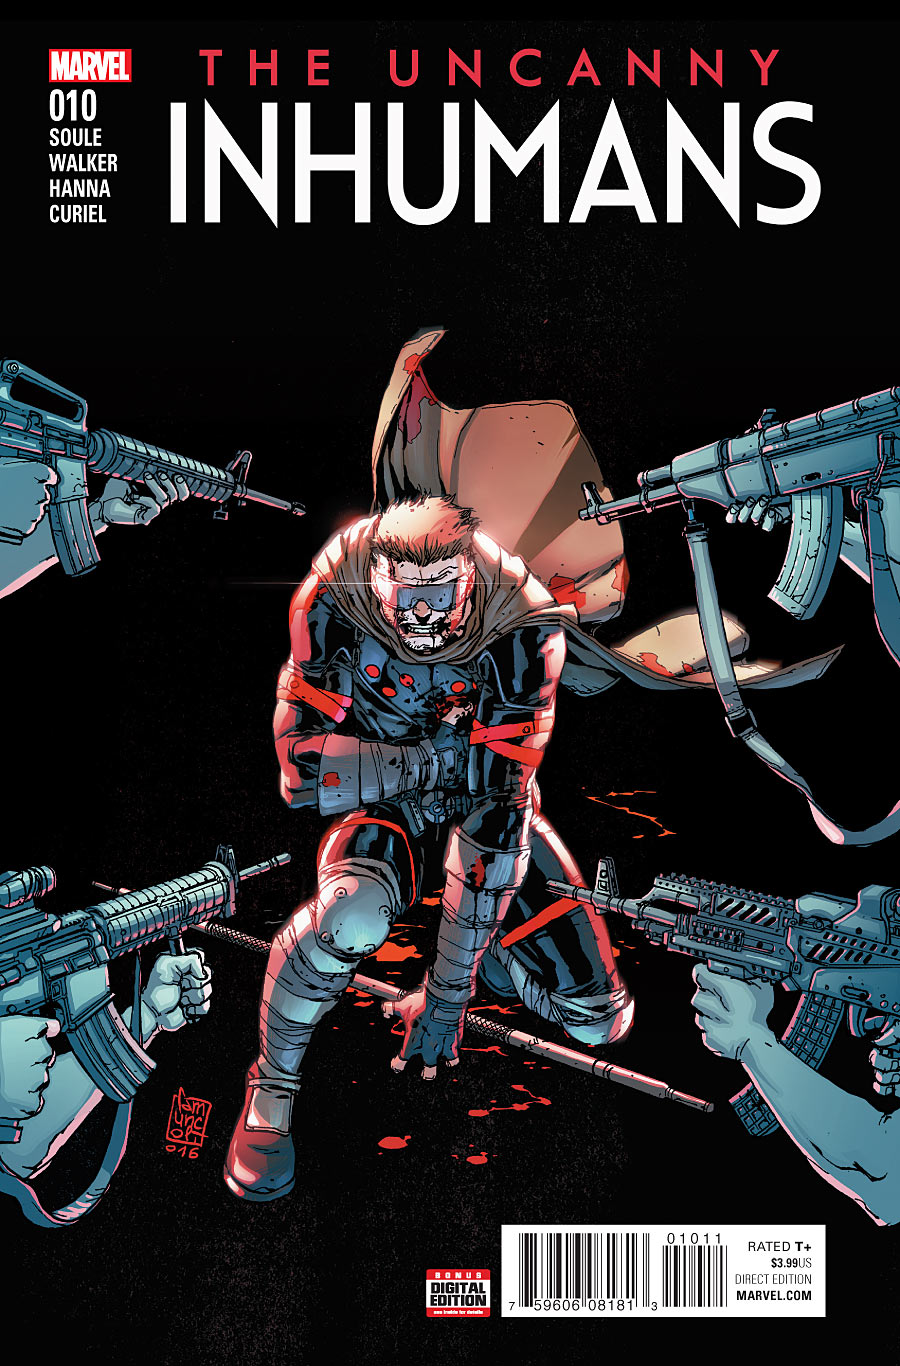 The Uncanny Inhumans #10